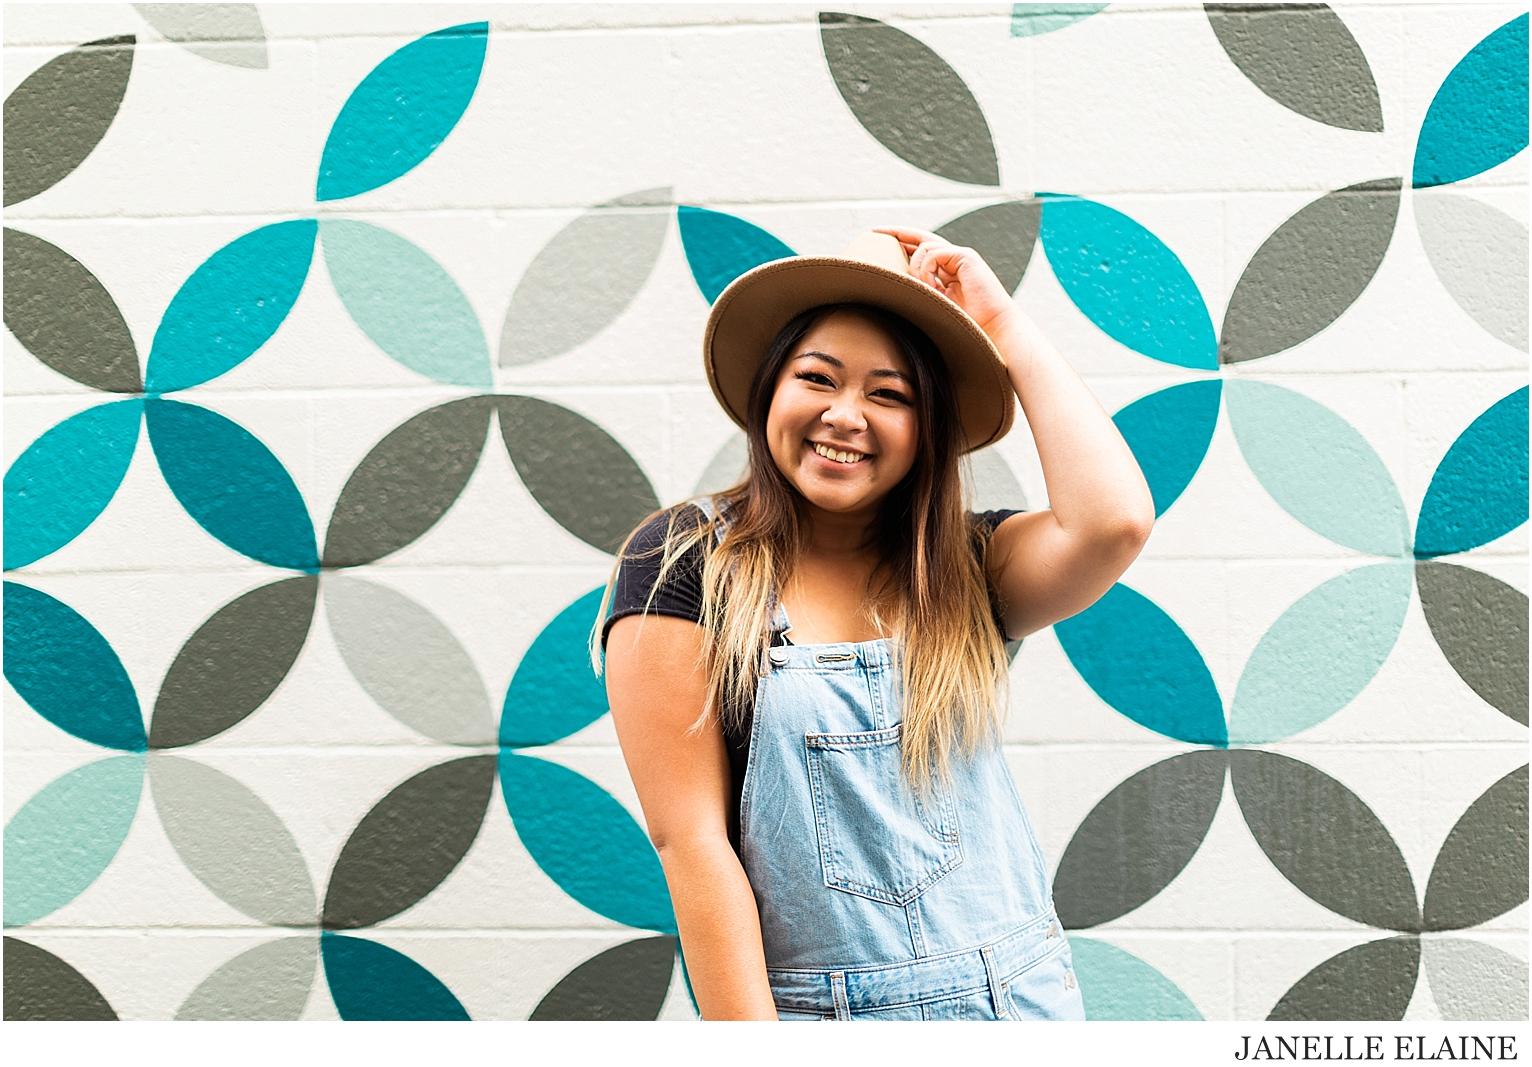 Aiko-Seattle WA-lifestyle photoshoot-Renton-Janelle Elaine Photography-17.jpg